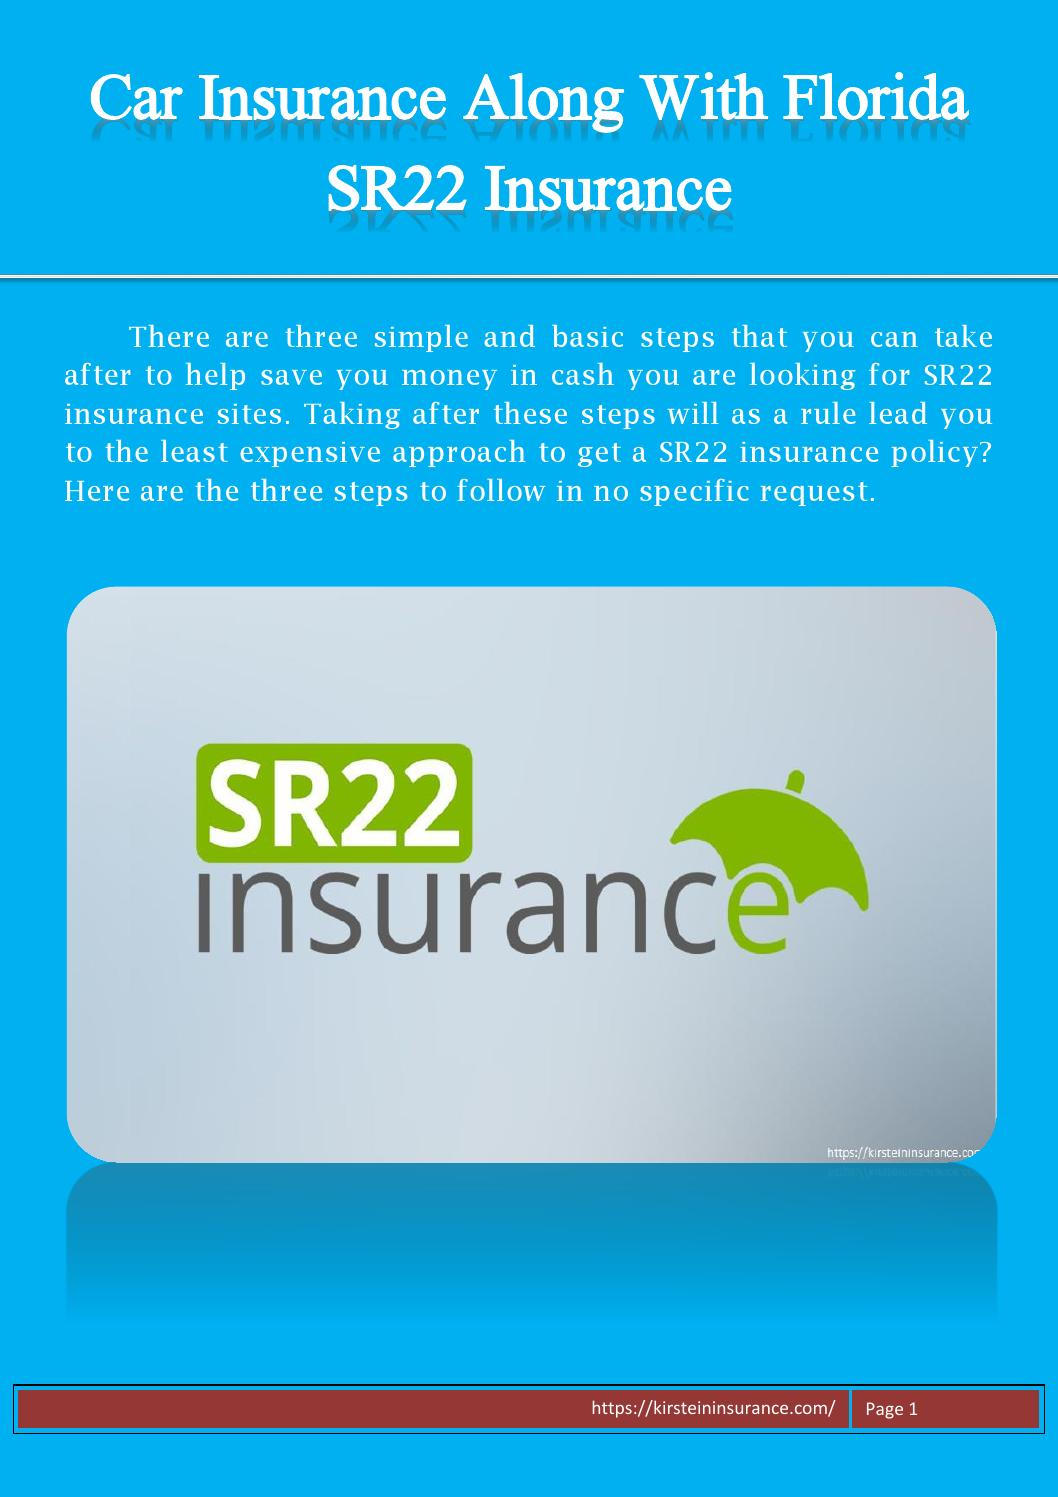 Car insurance along with florida sr22 insurance by Steven ...